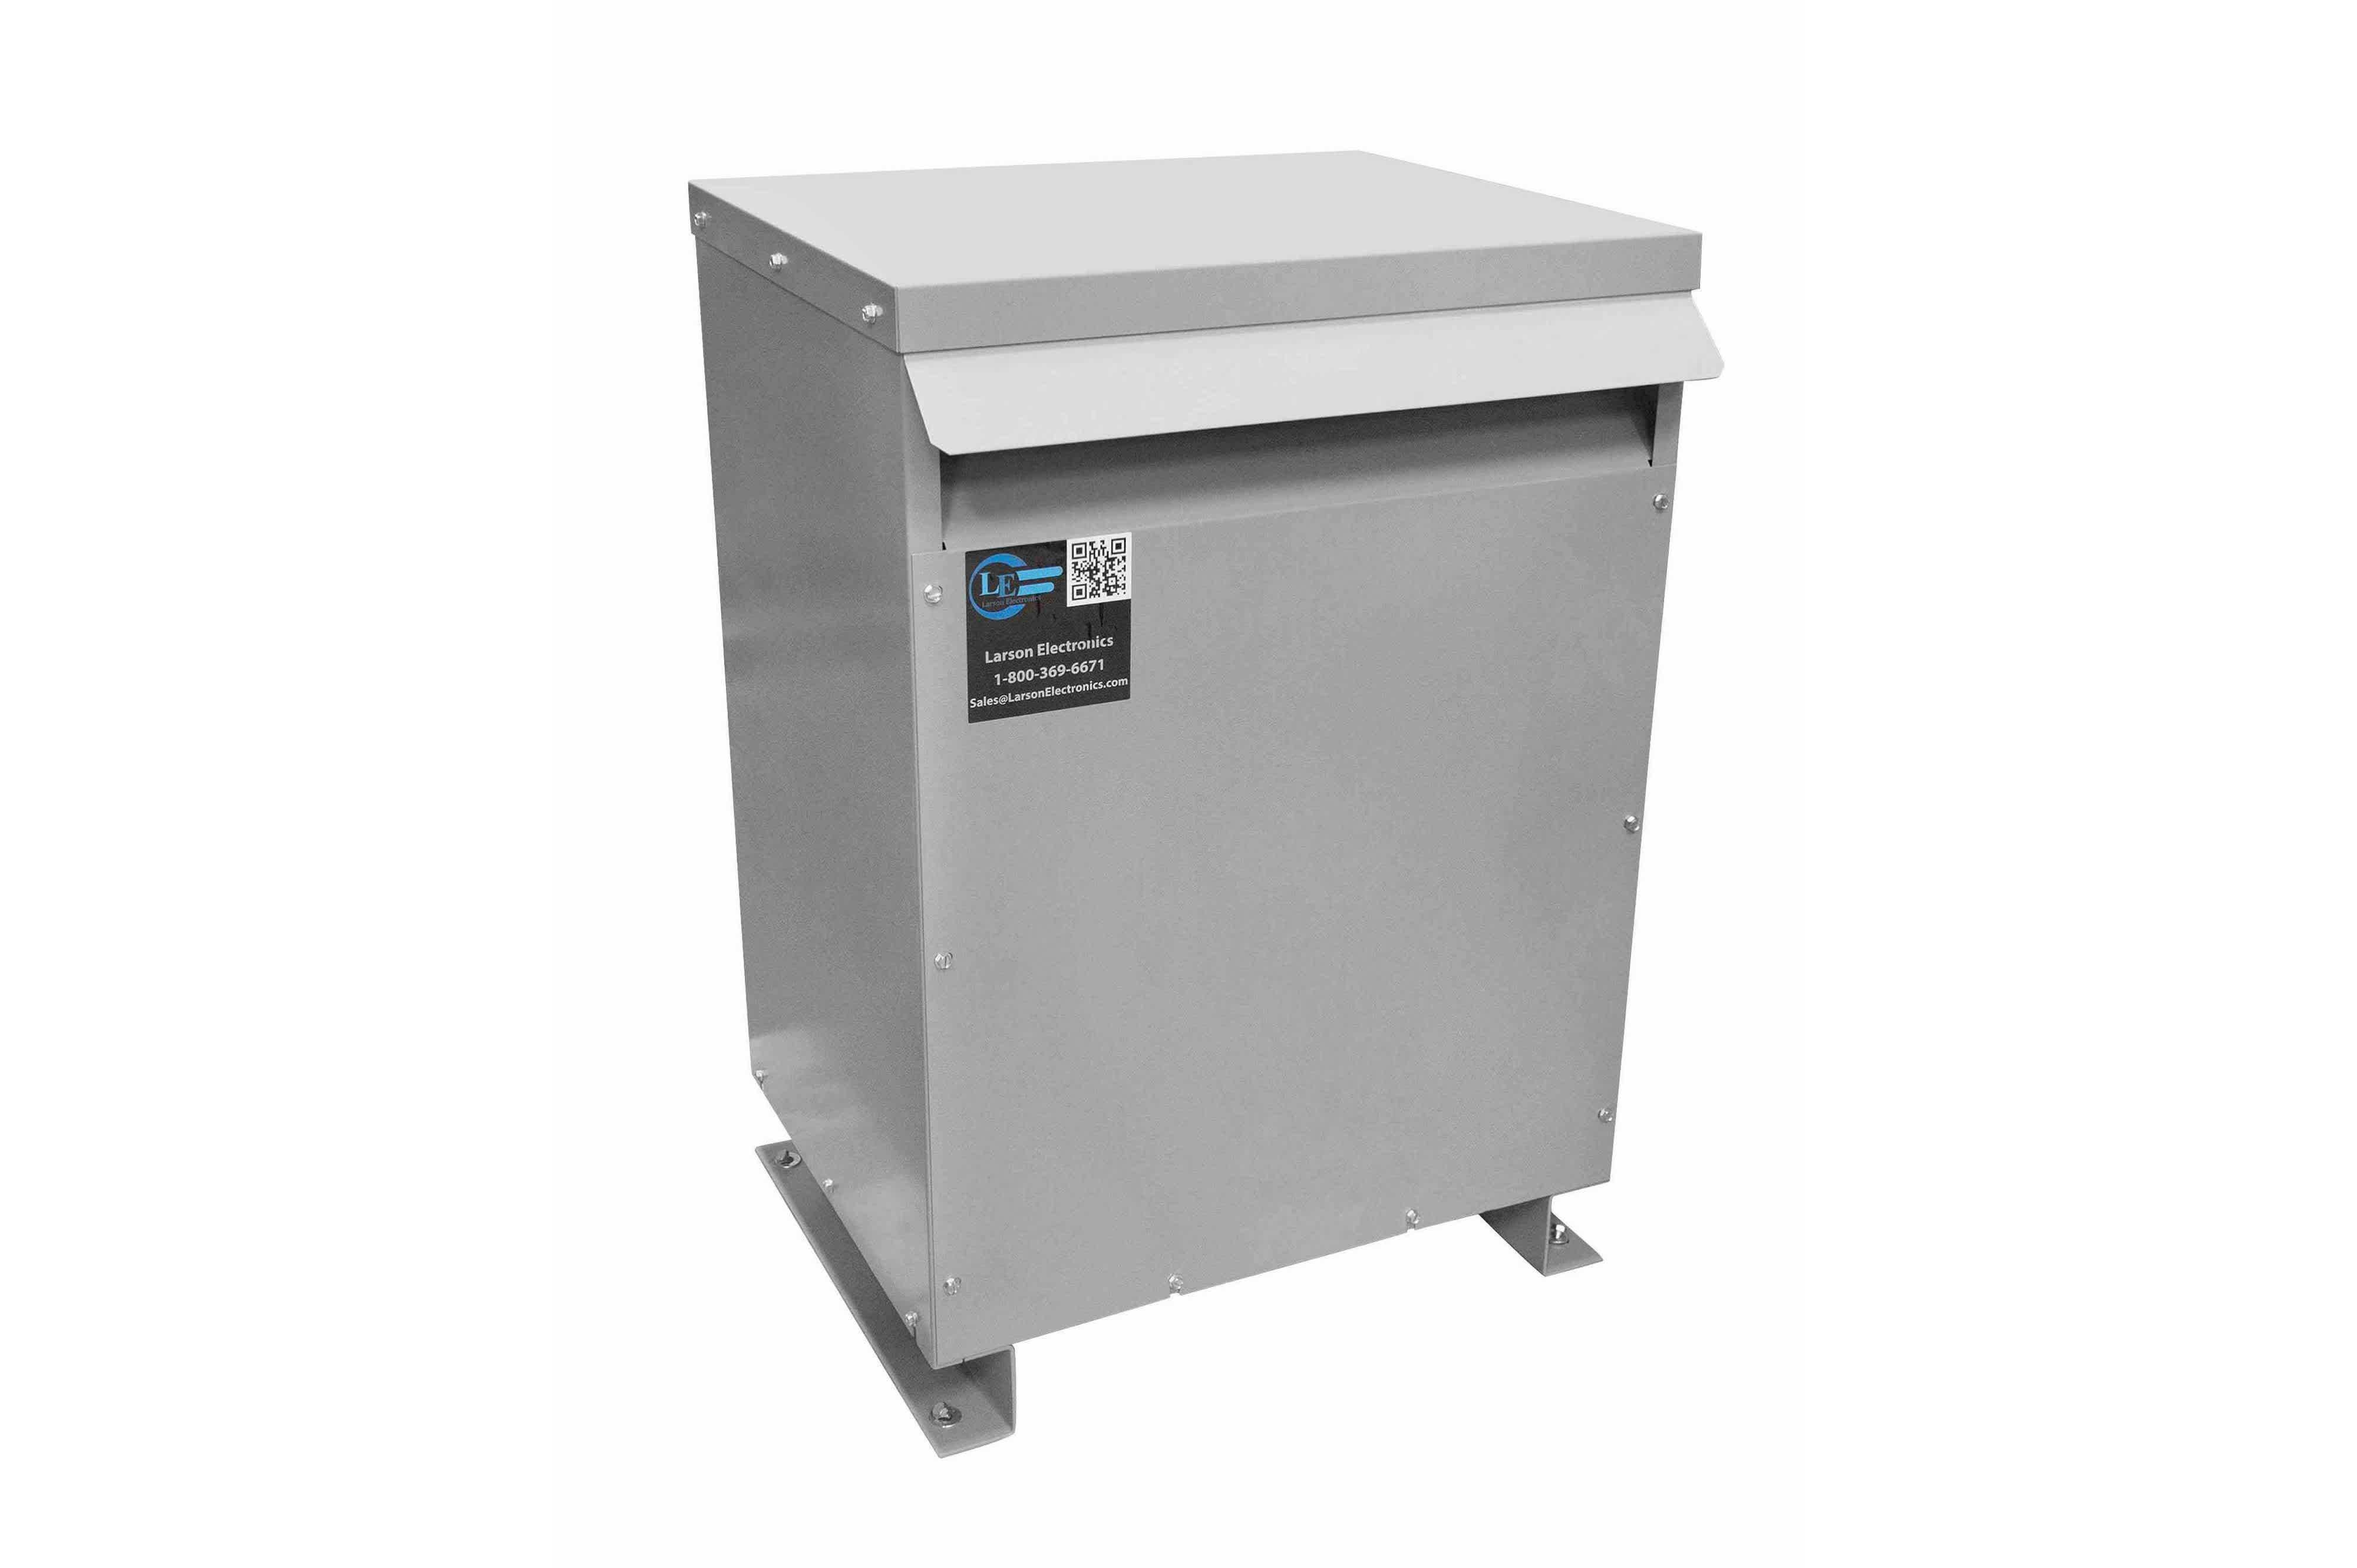 150 kVA 3PH Isolation Transformer, 208V Wye Primary, 380Y/220 Wye-N Secondary, N3R, Ventilated, 60 Hz